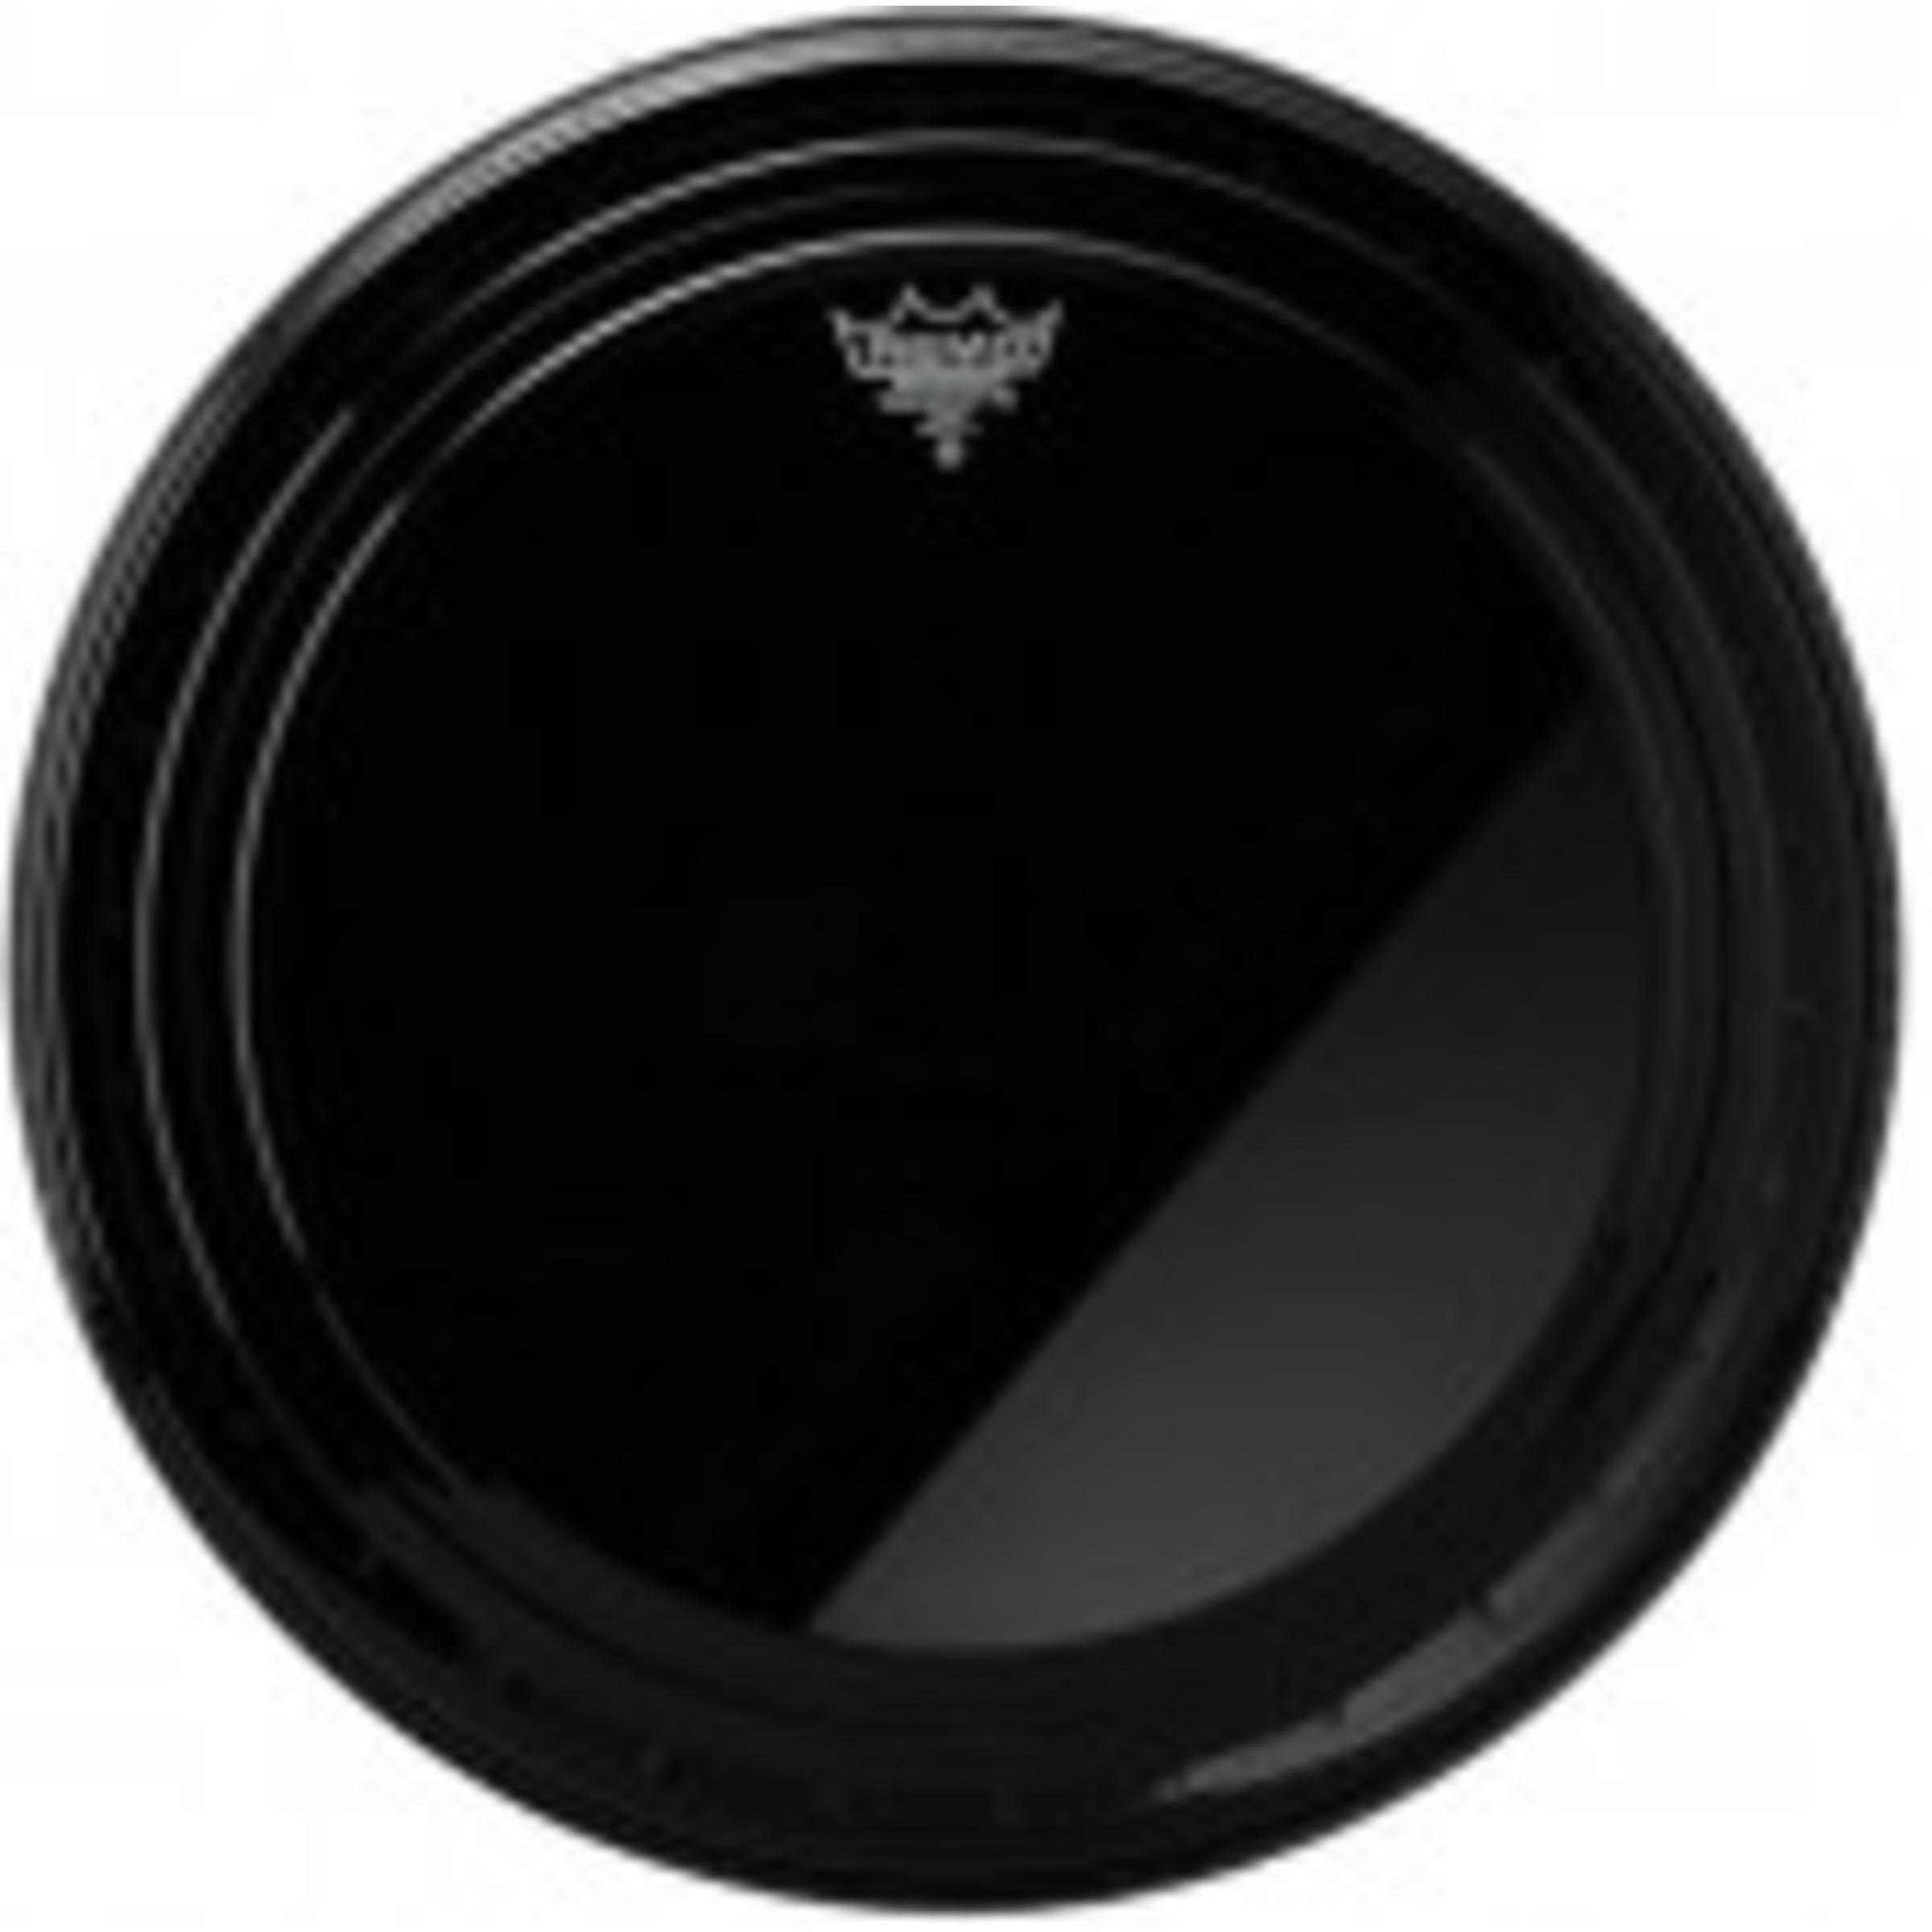 remo powerstroke pro bass resonant head giggear. Black Bedroom Furniture Sets. Home Design Ideas